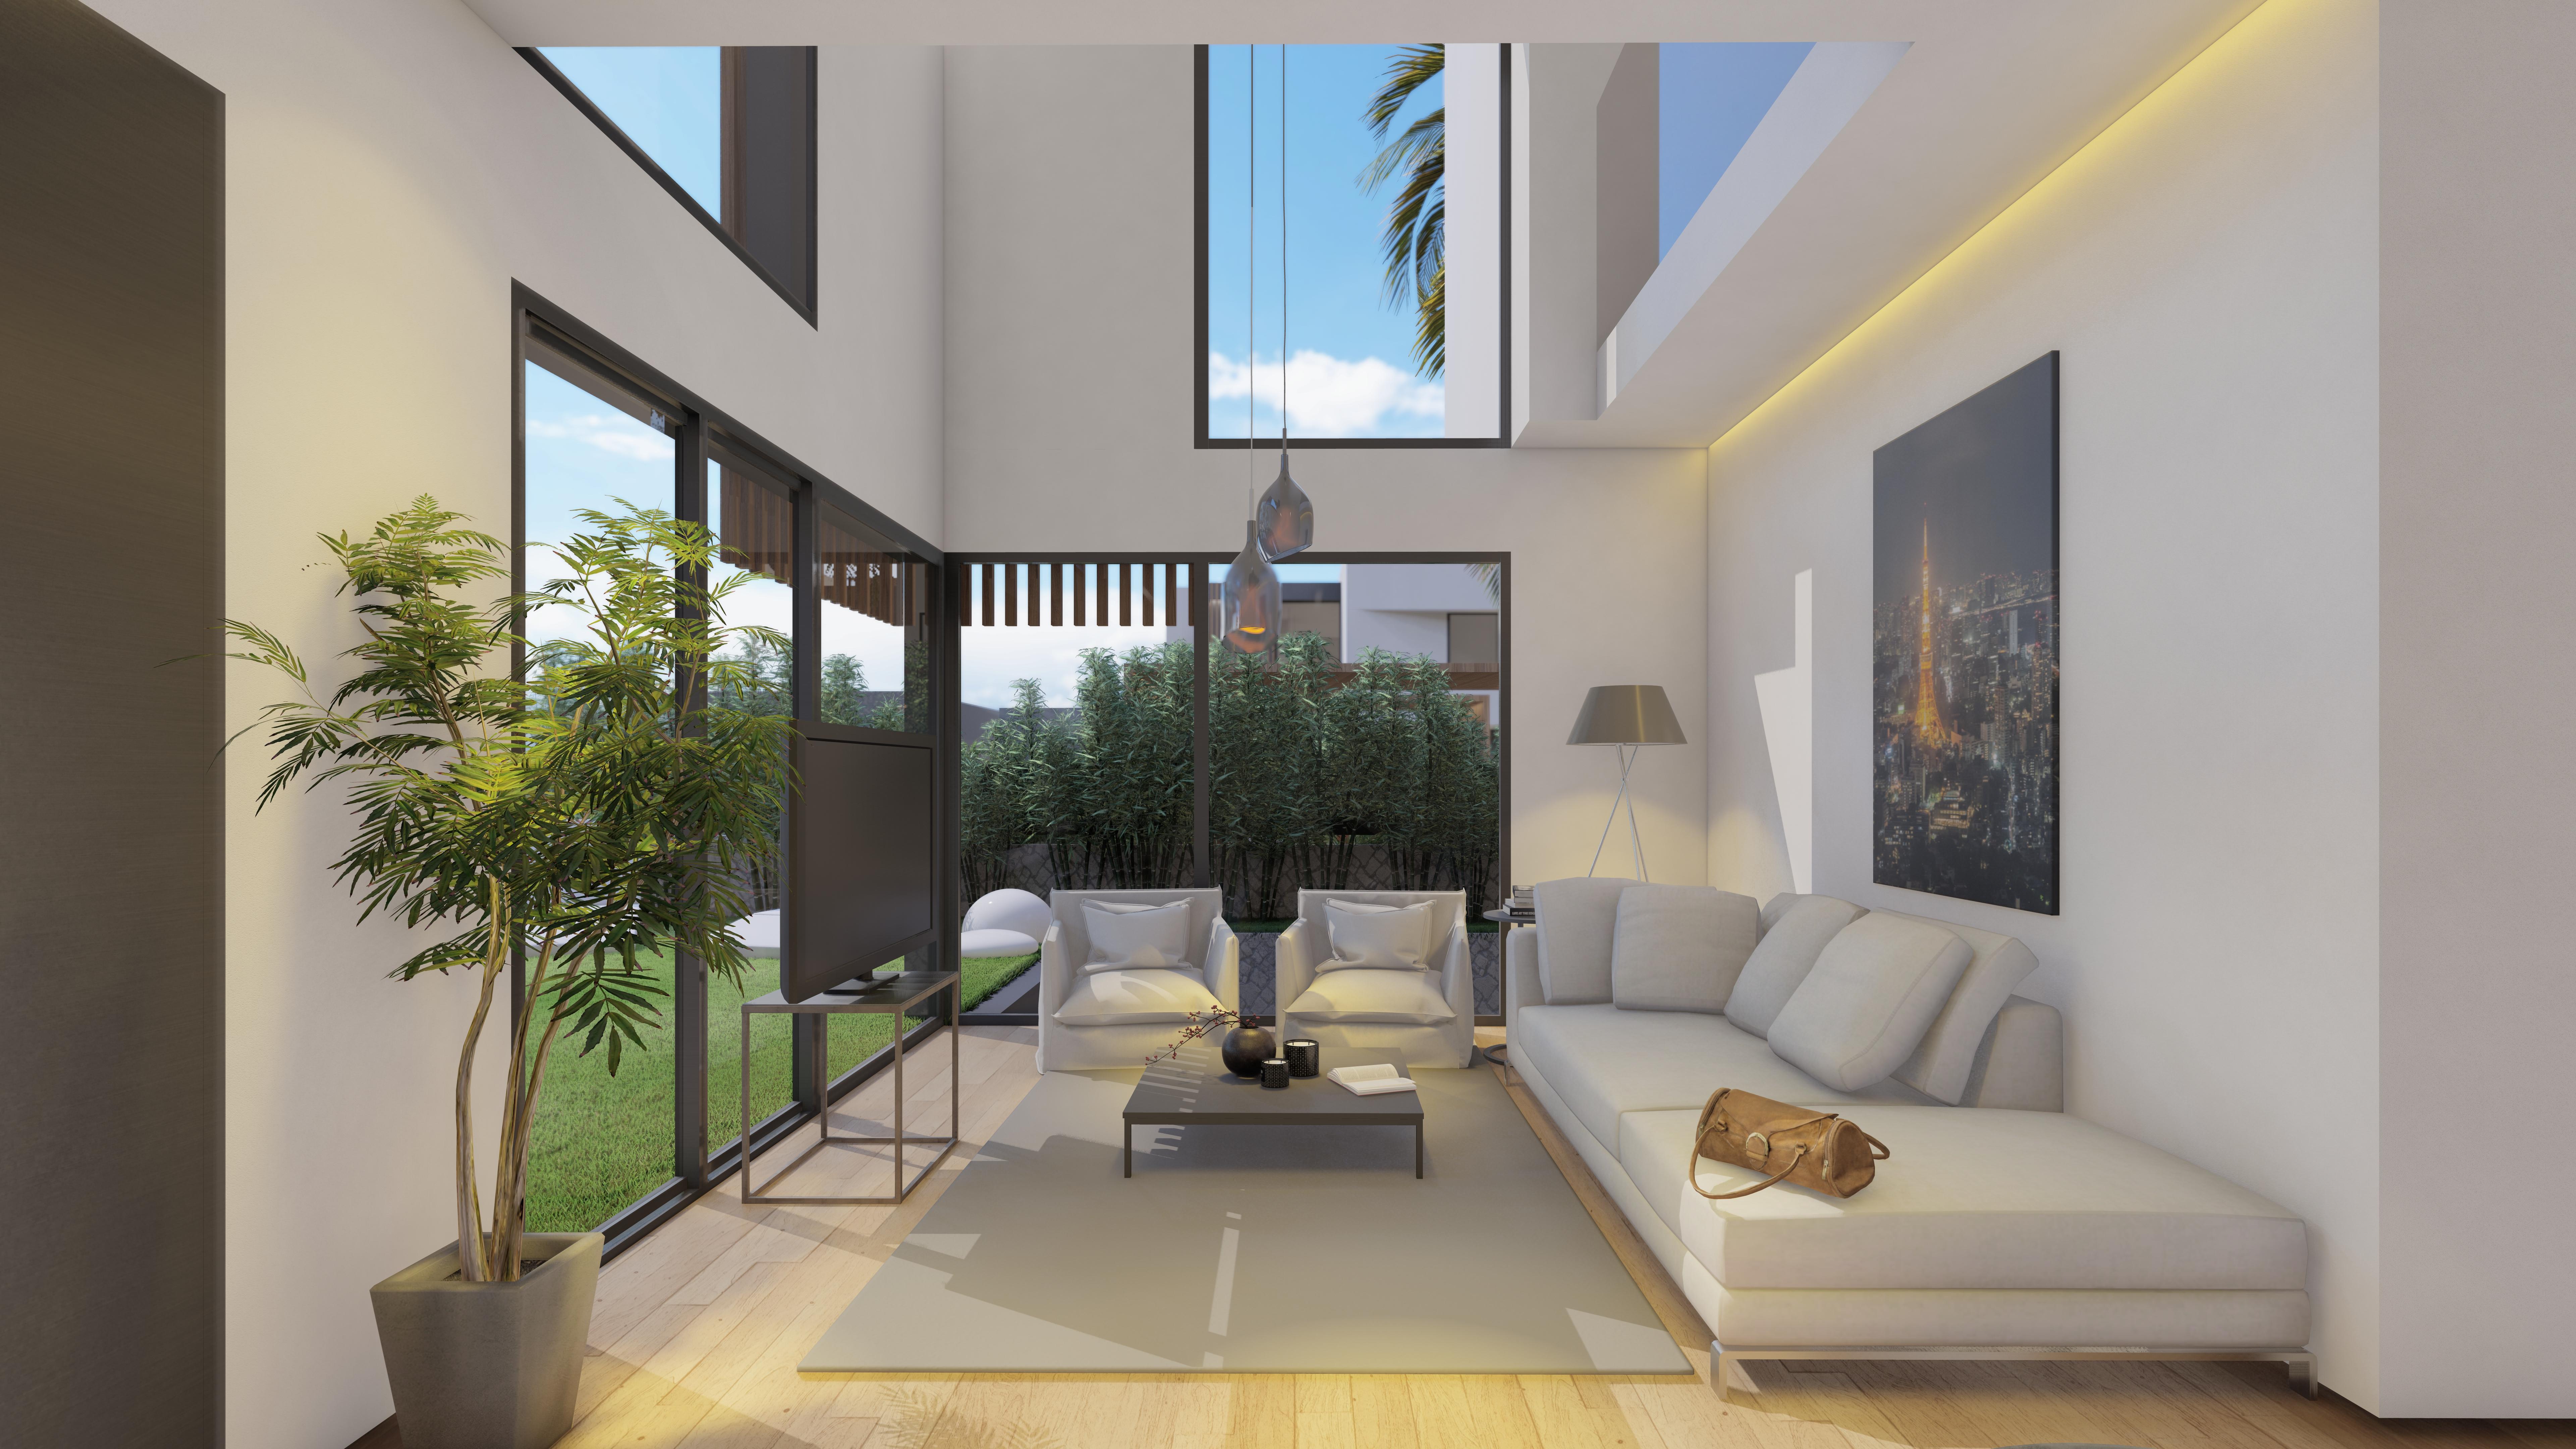 Residencial Cinque by Baraka, salón